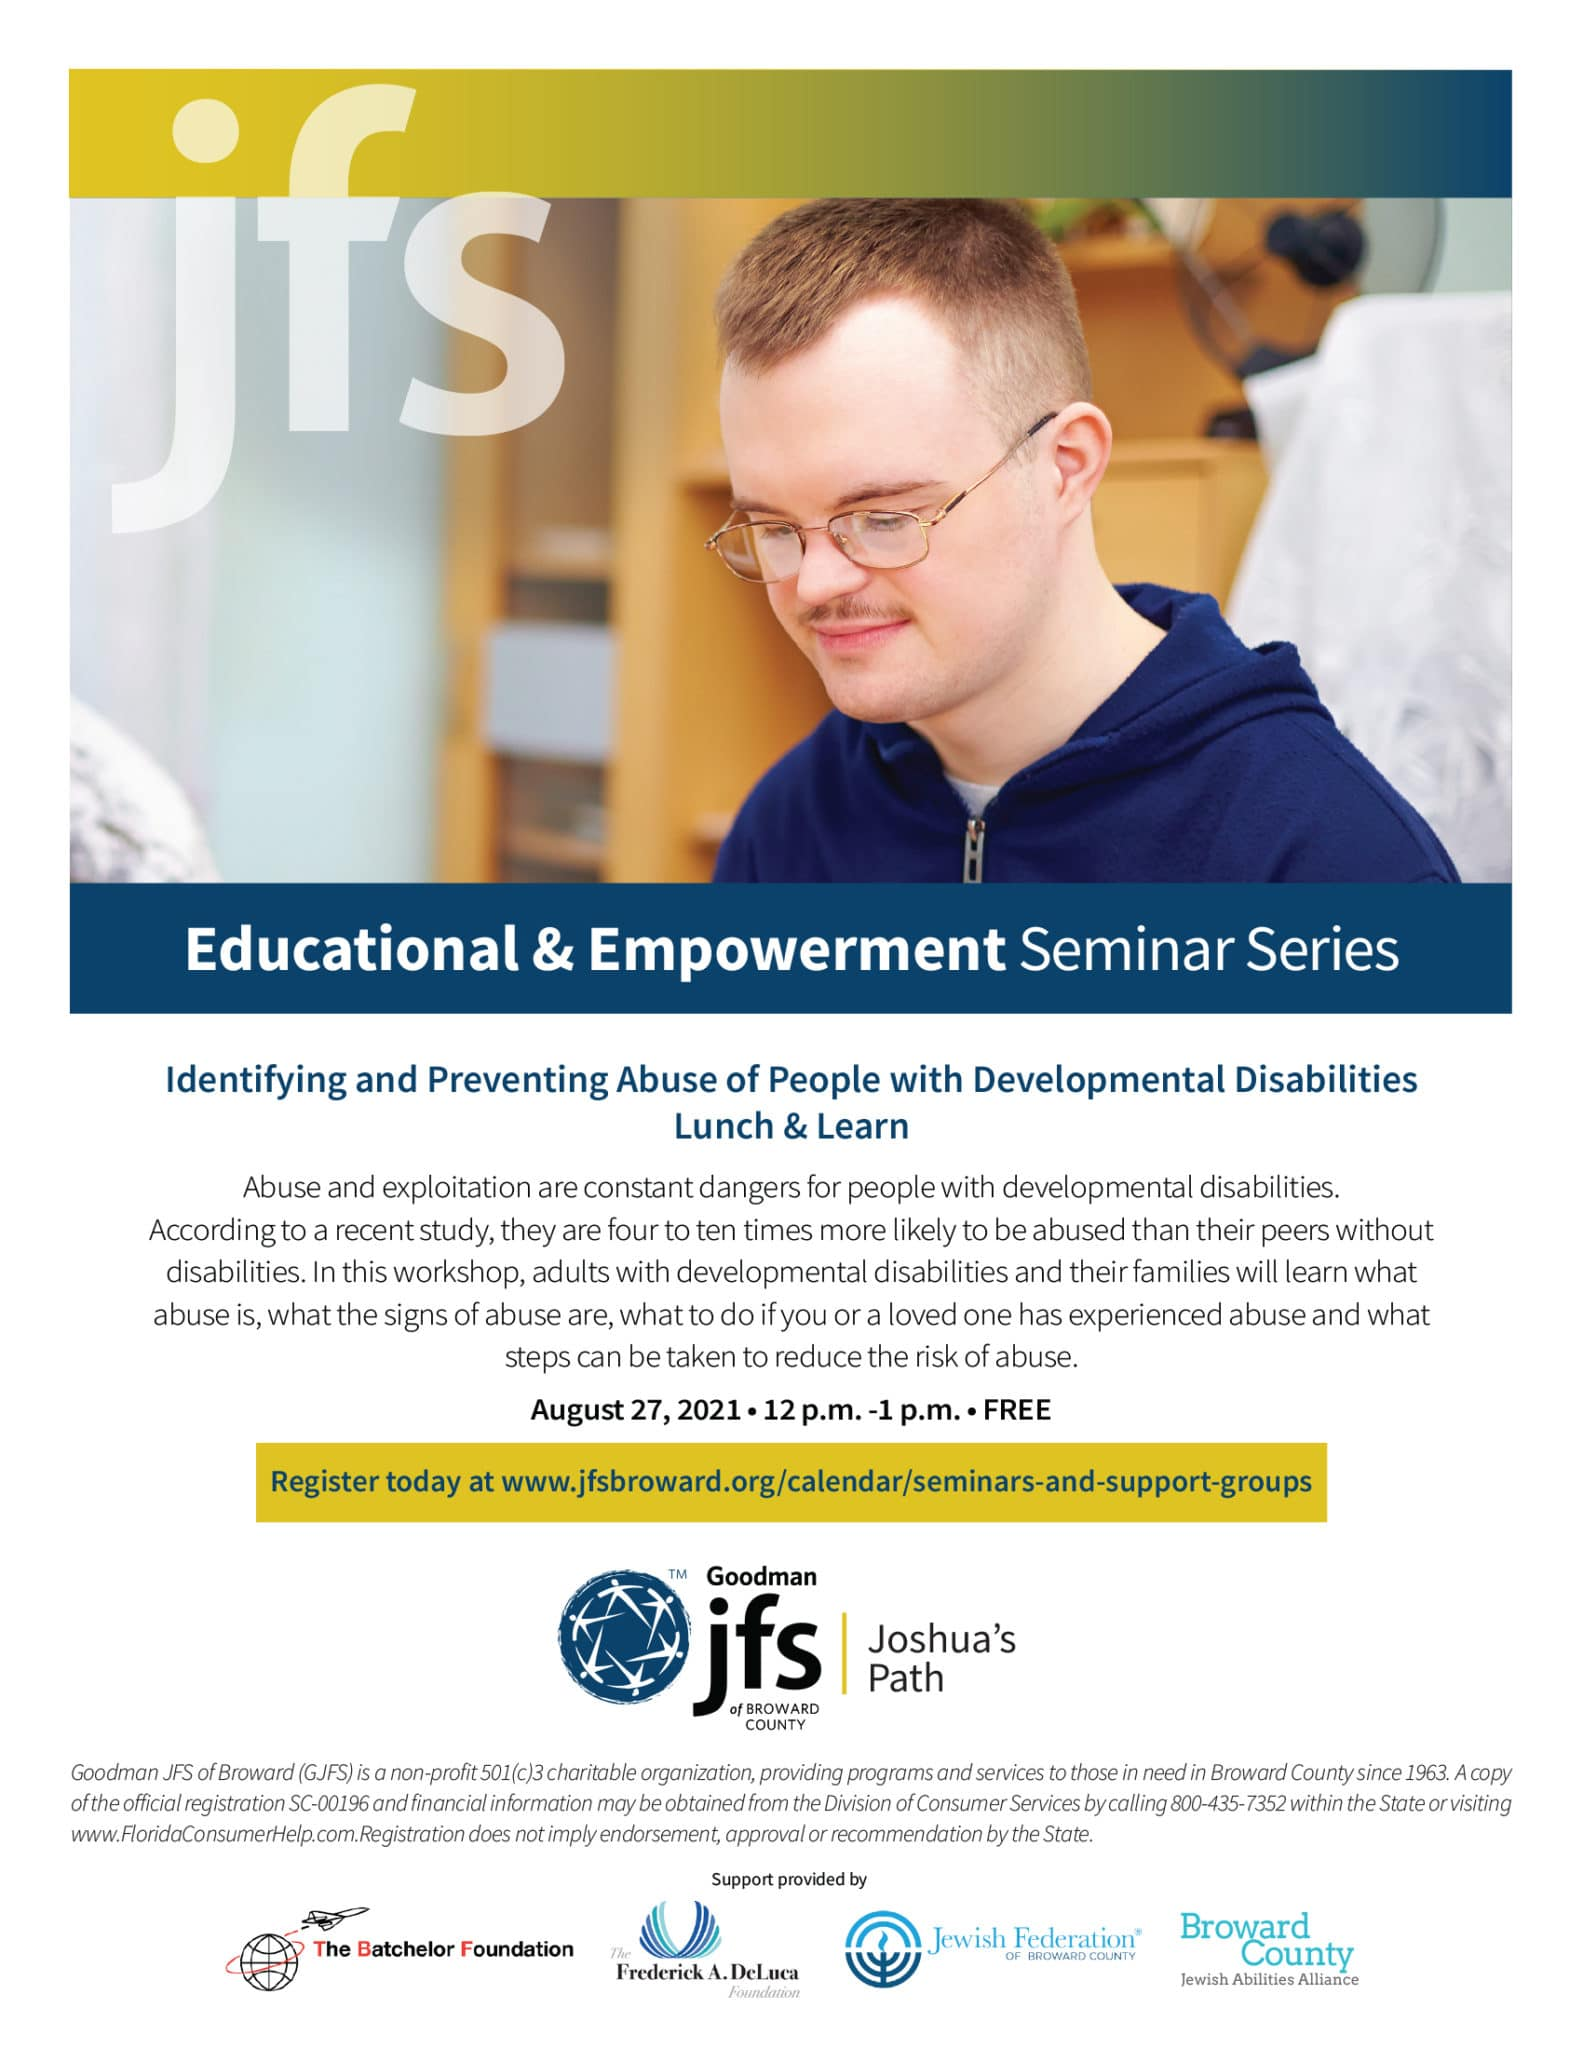 Joshua's Path Seminar Flyer 082721